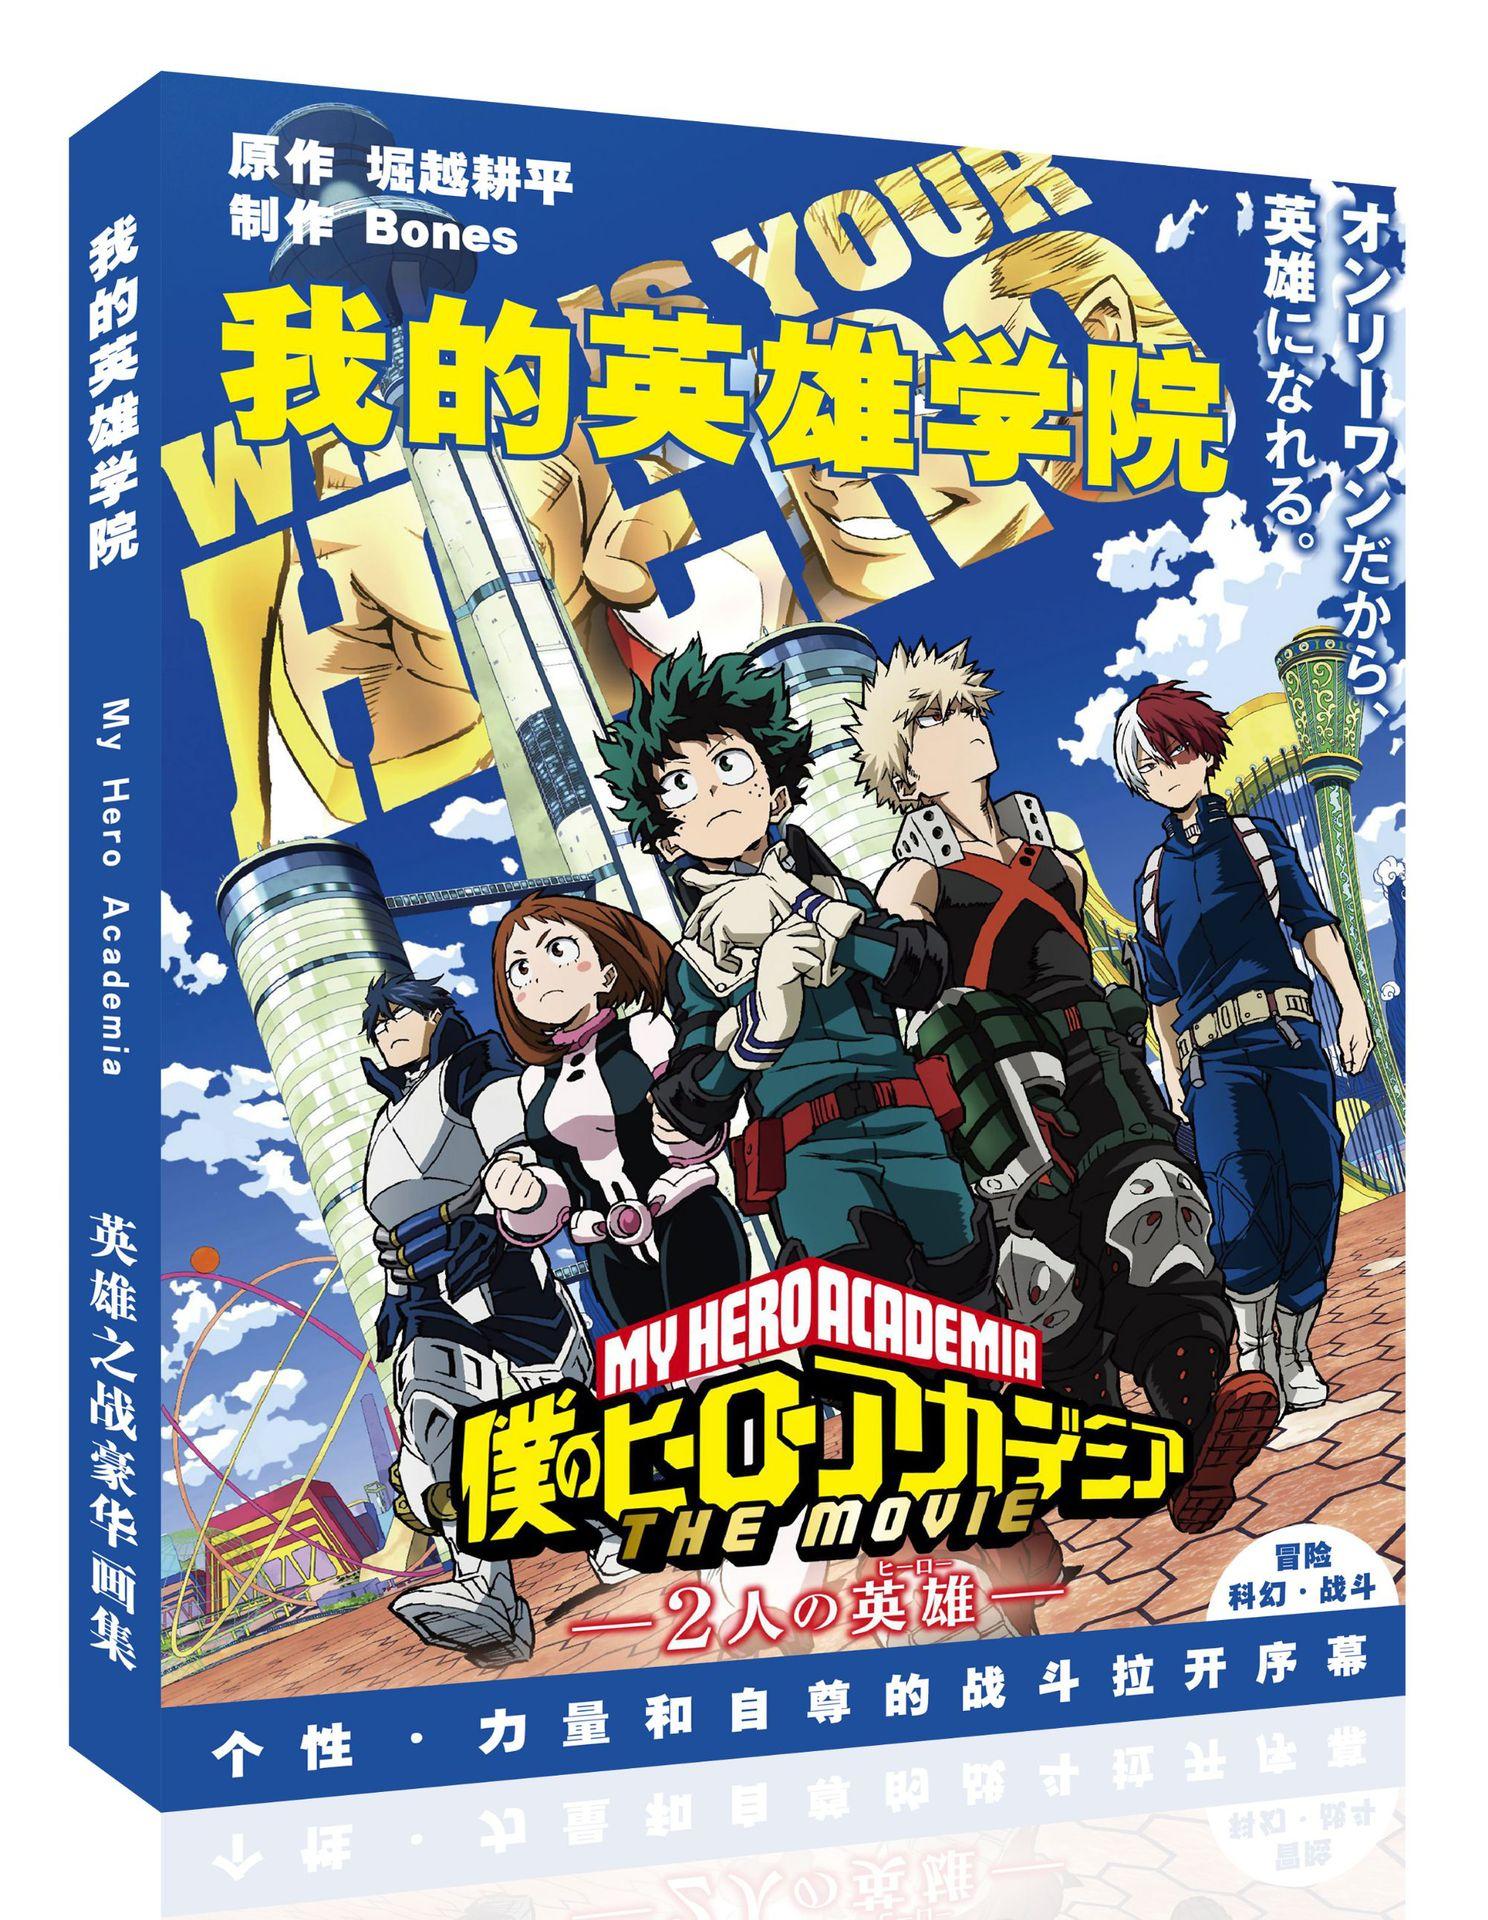 Anime Boku No My Hero Academia Art Book Deku Shoto Bakugou Fanart Catalog Brochure Illustrations Artbook